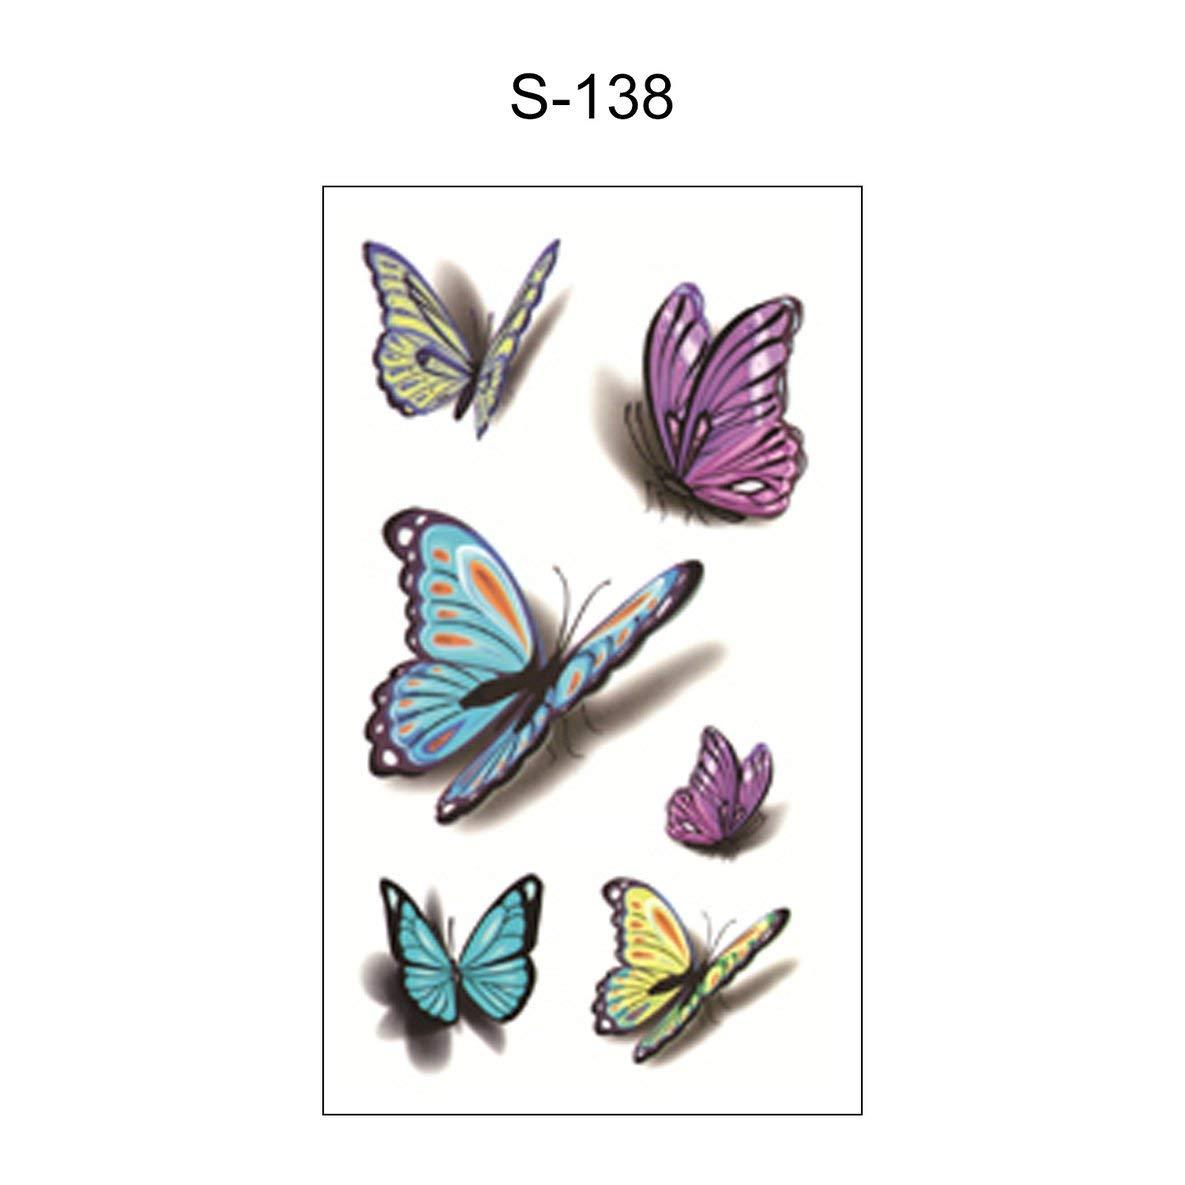 Noradtjcca Waterproof Simulation Temporary Tattoo Stickers Fashion Fake Tattoos Body Art Sticker for Adult Men Women Kids 105x60